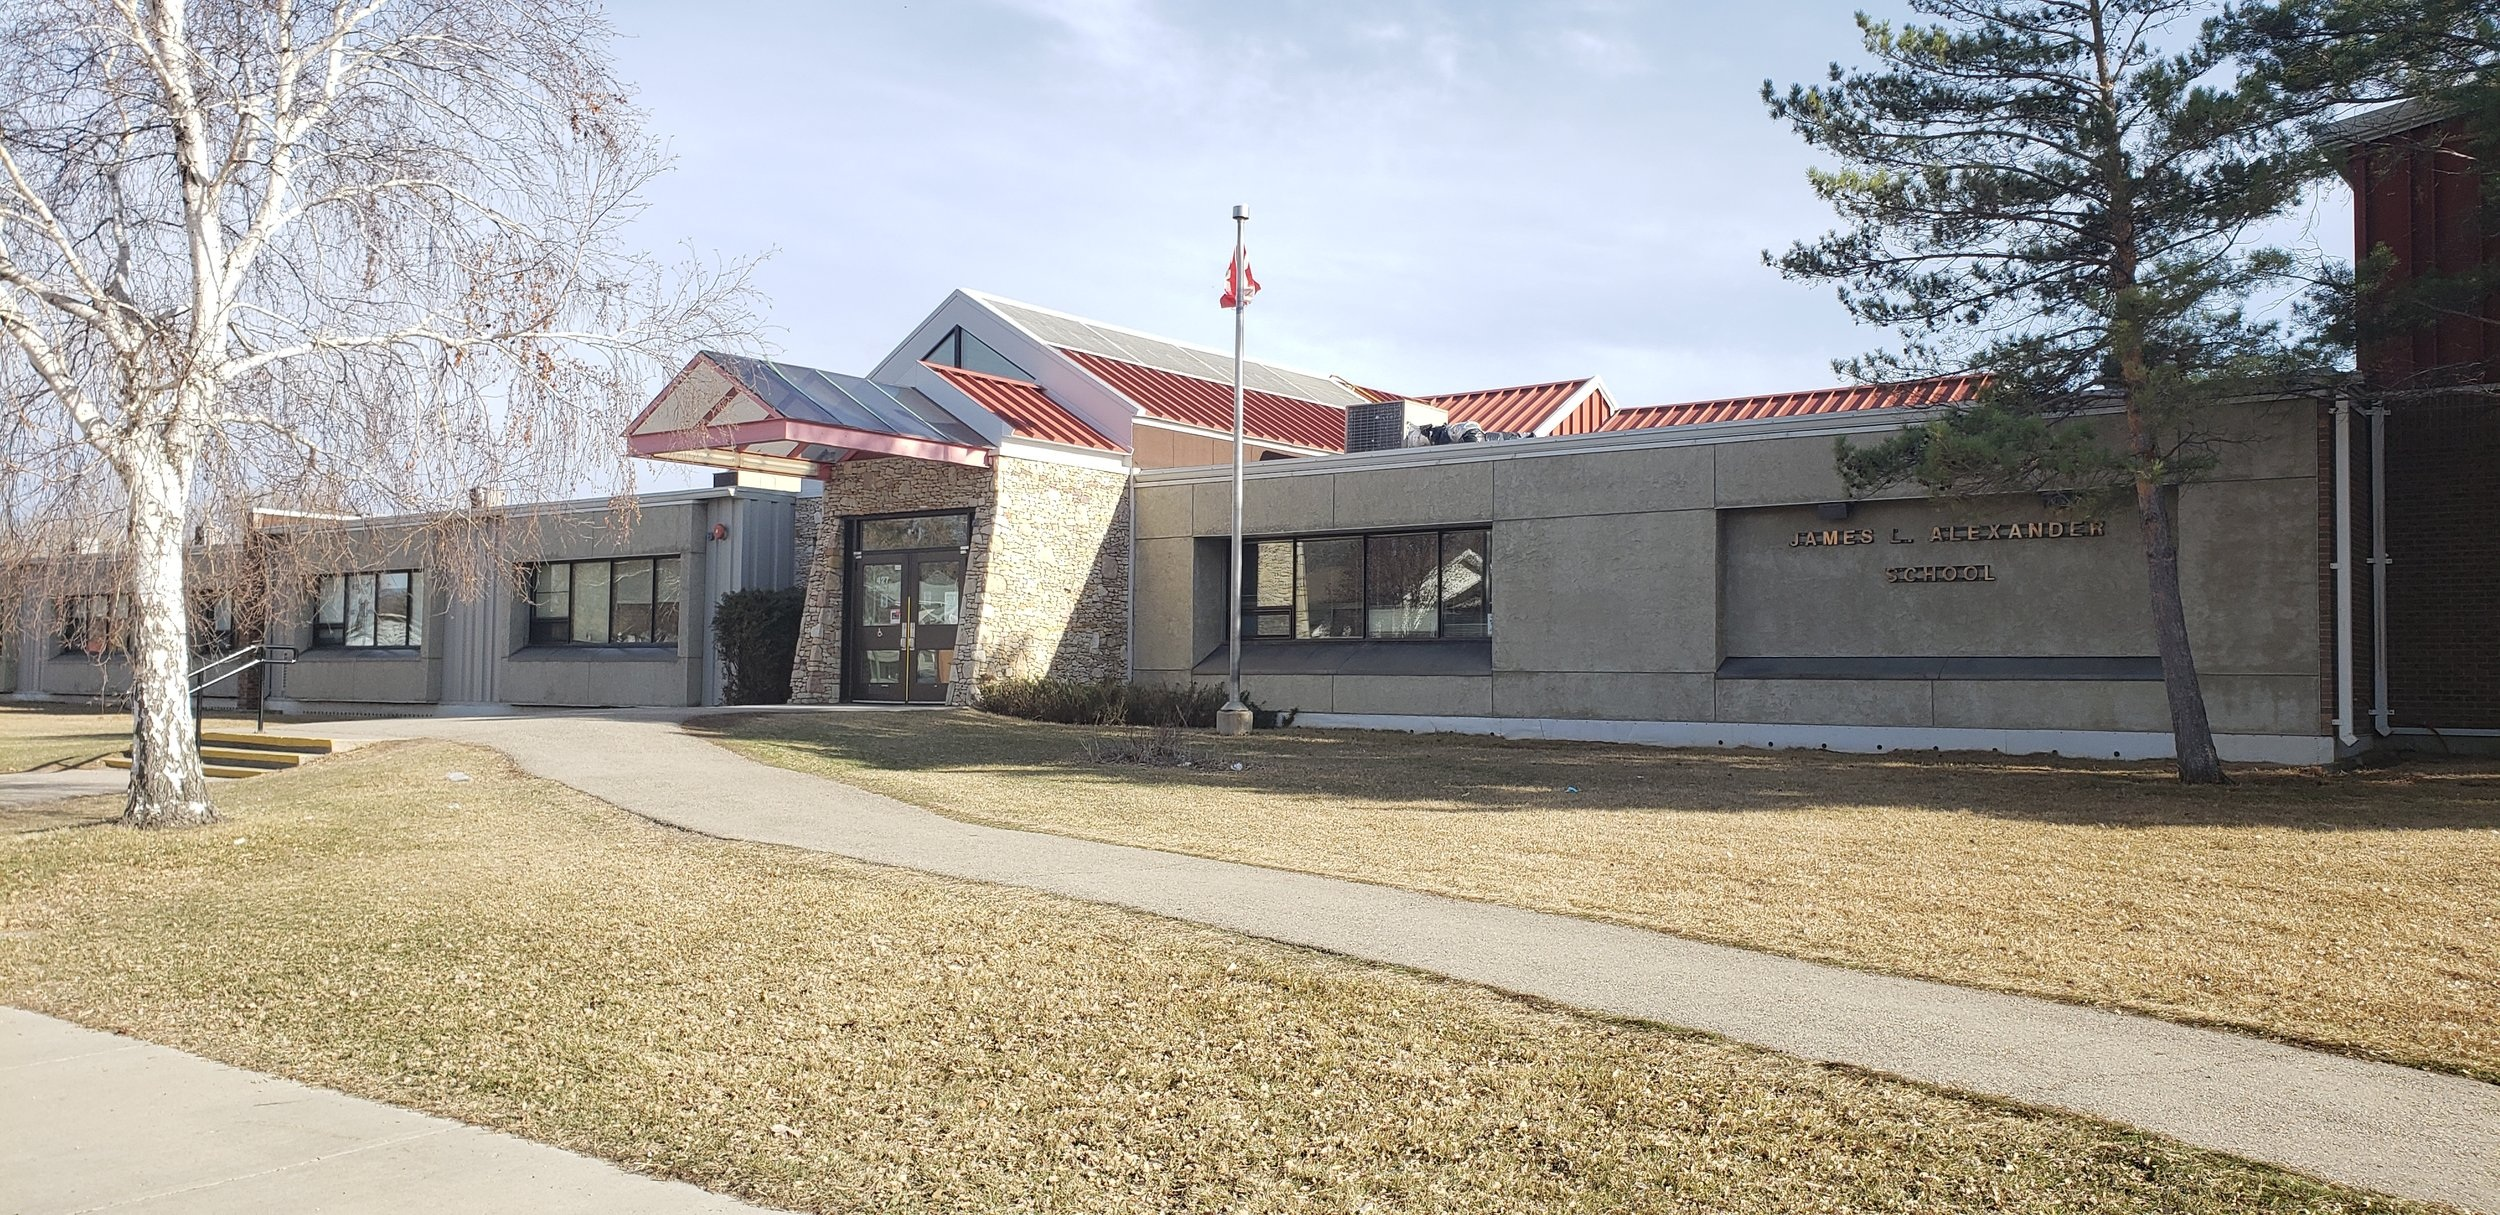 James L. Alexander -               427 McCormack Road, Saskatoon, SK, S7M 5L8          JamesL.AlexanderSchool@spsd.sk.ca - (306) 683 - 7280